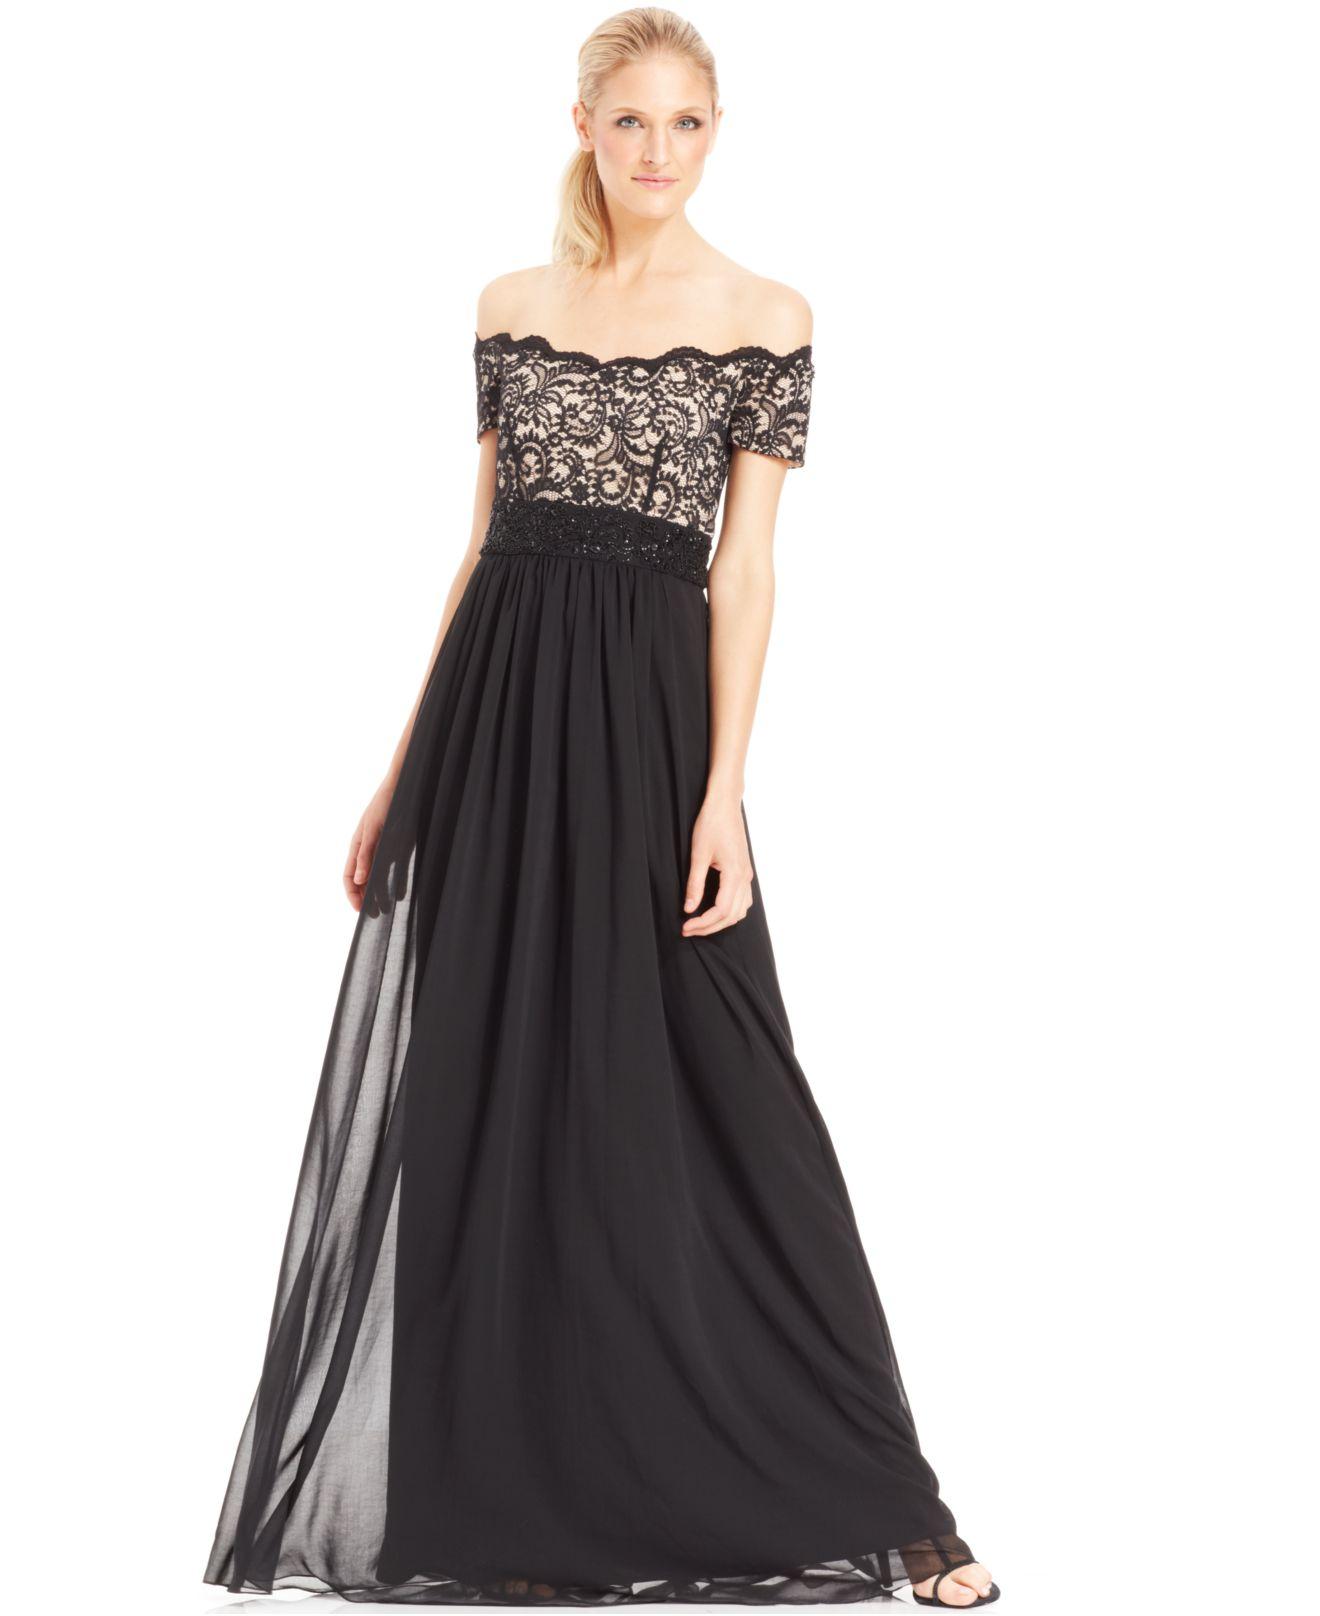 Lyst - Js Boutique Off-The-Shoulder Embellished Lace Gown in Black